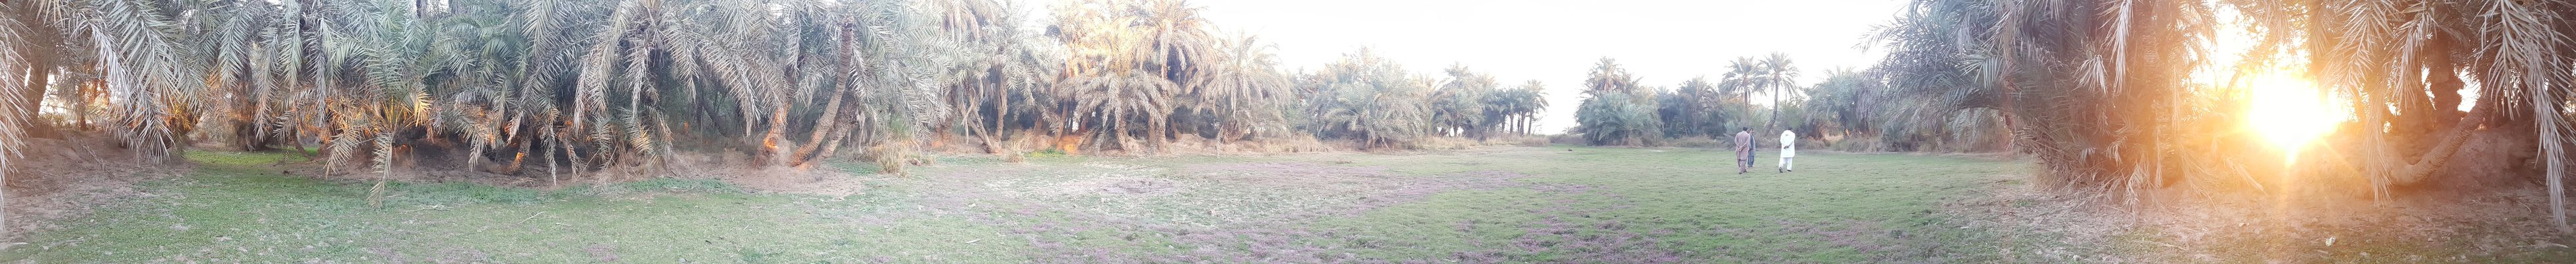 Around the west bank of Jehlum River Khushab 360 Panorama